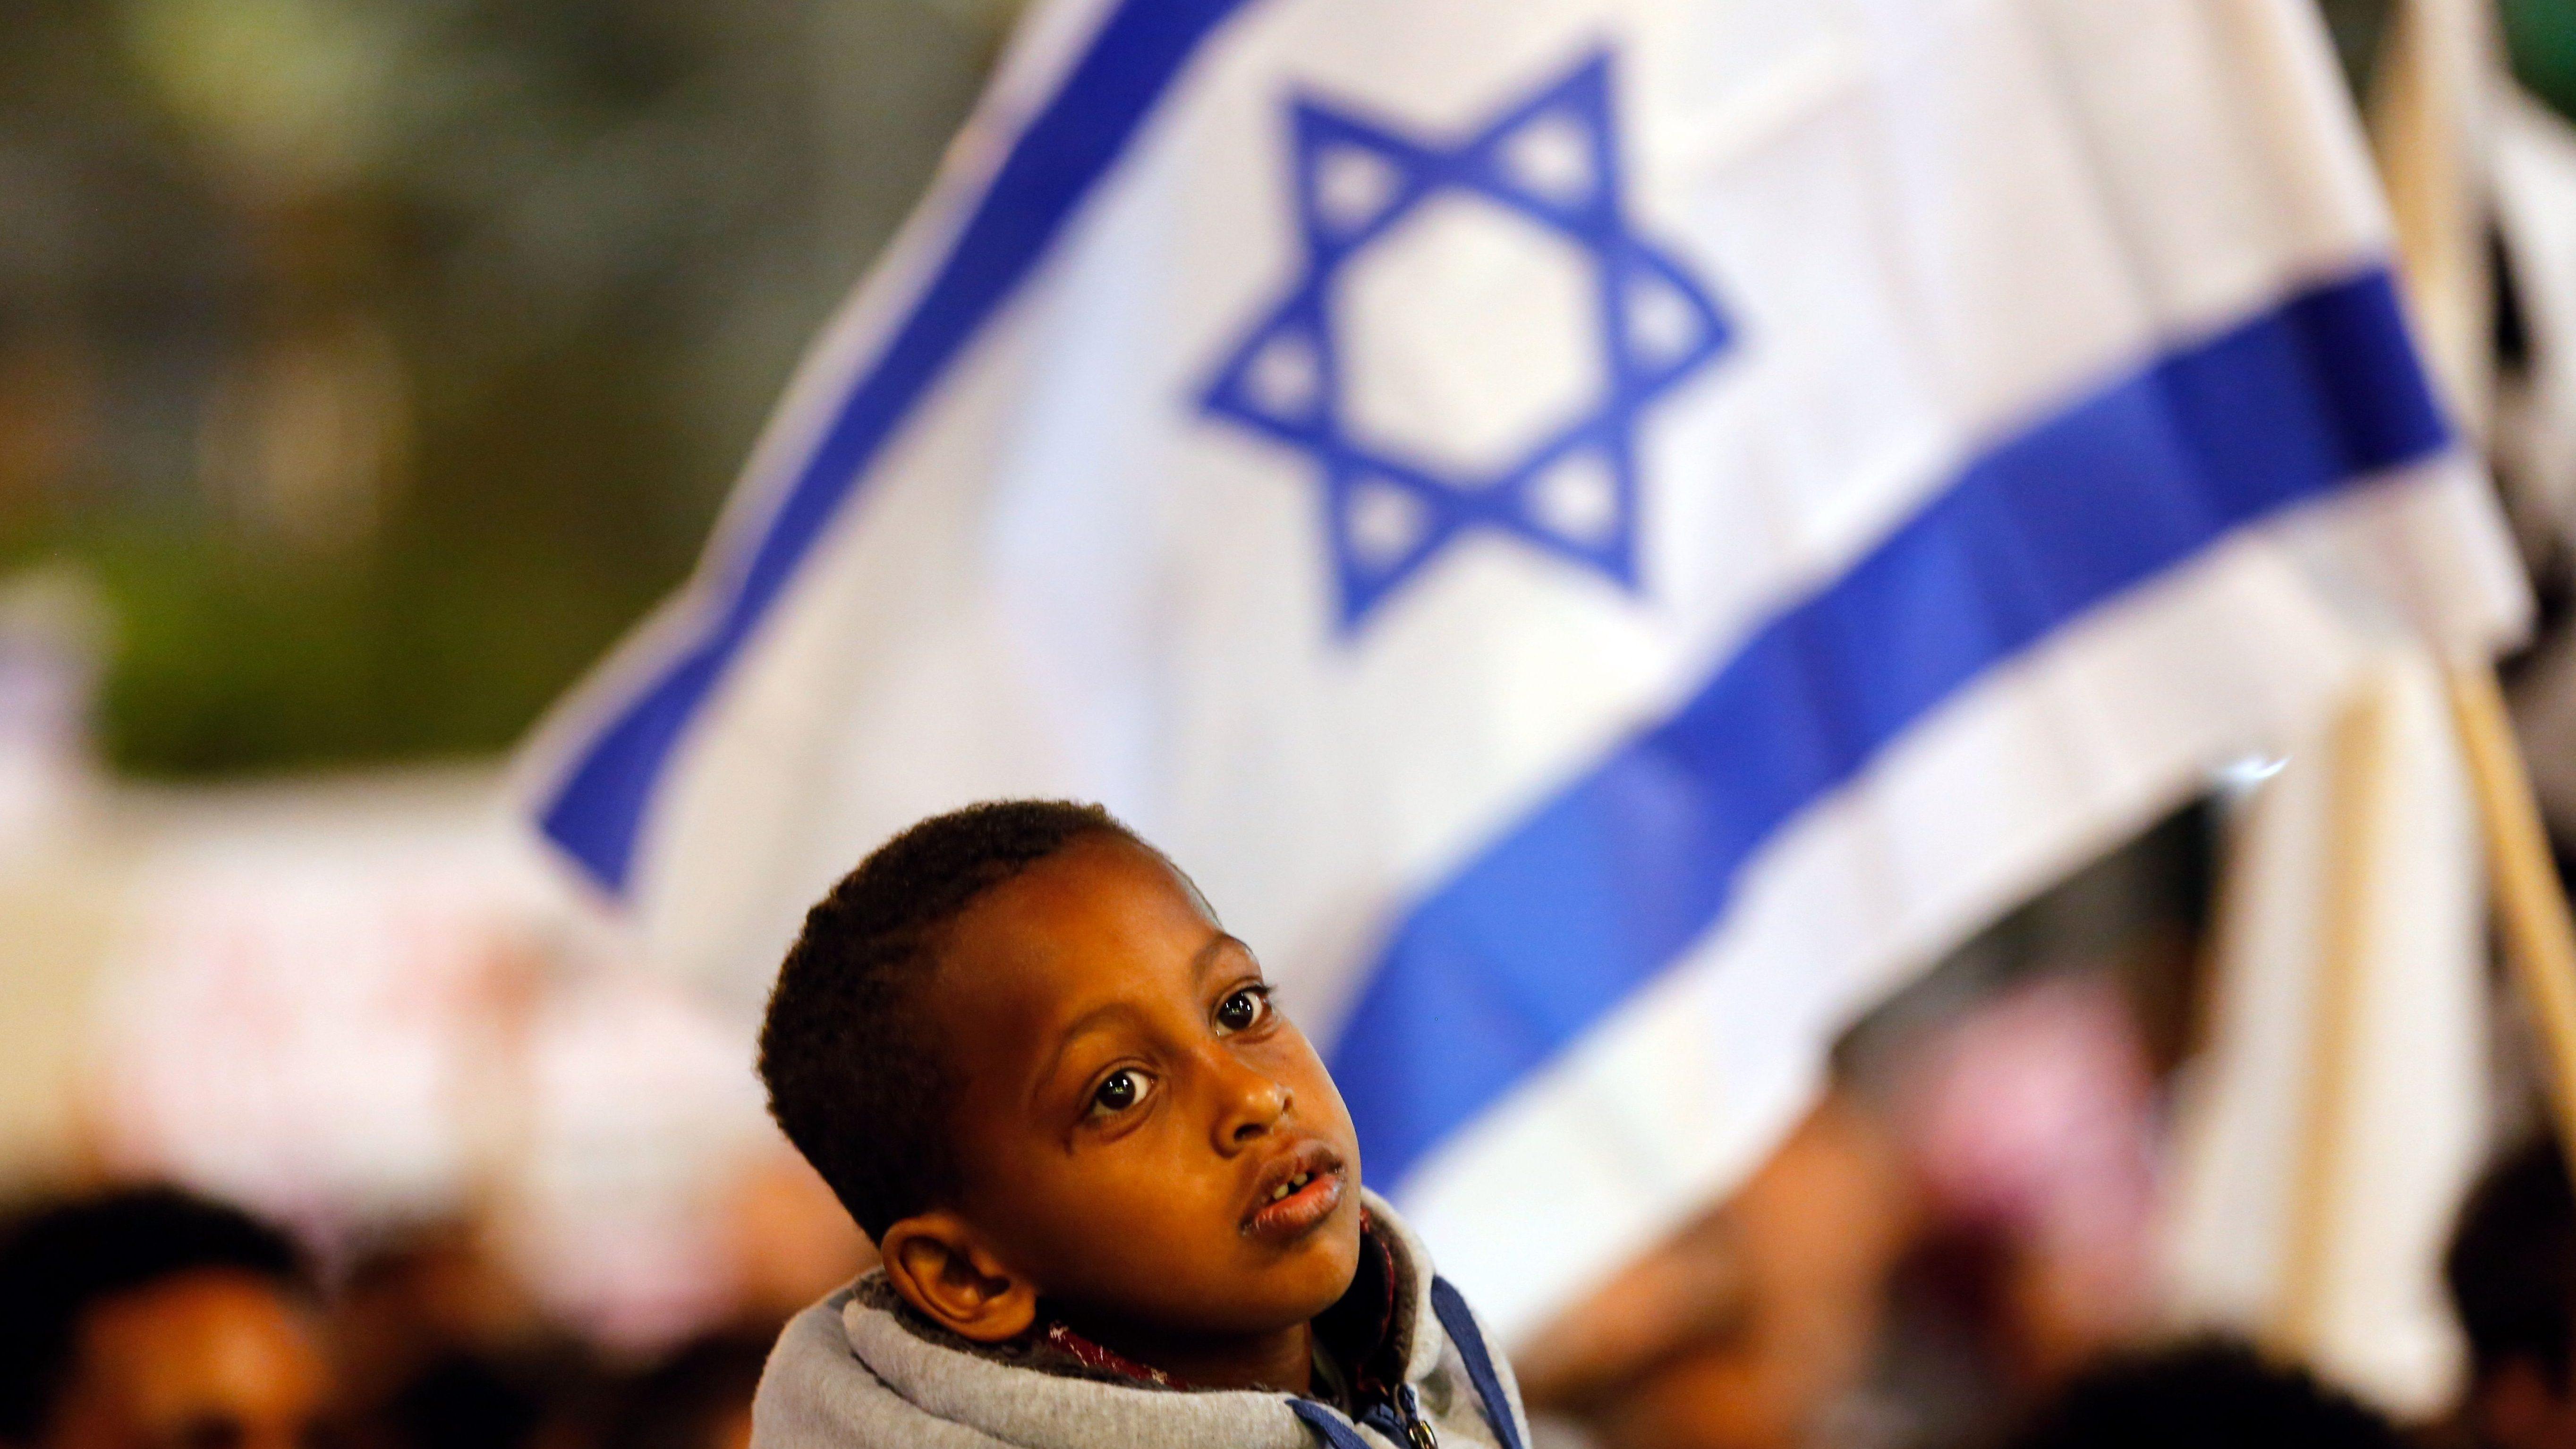 Israel delays African migrant deportation till after Passover on